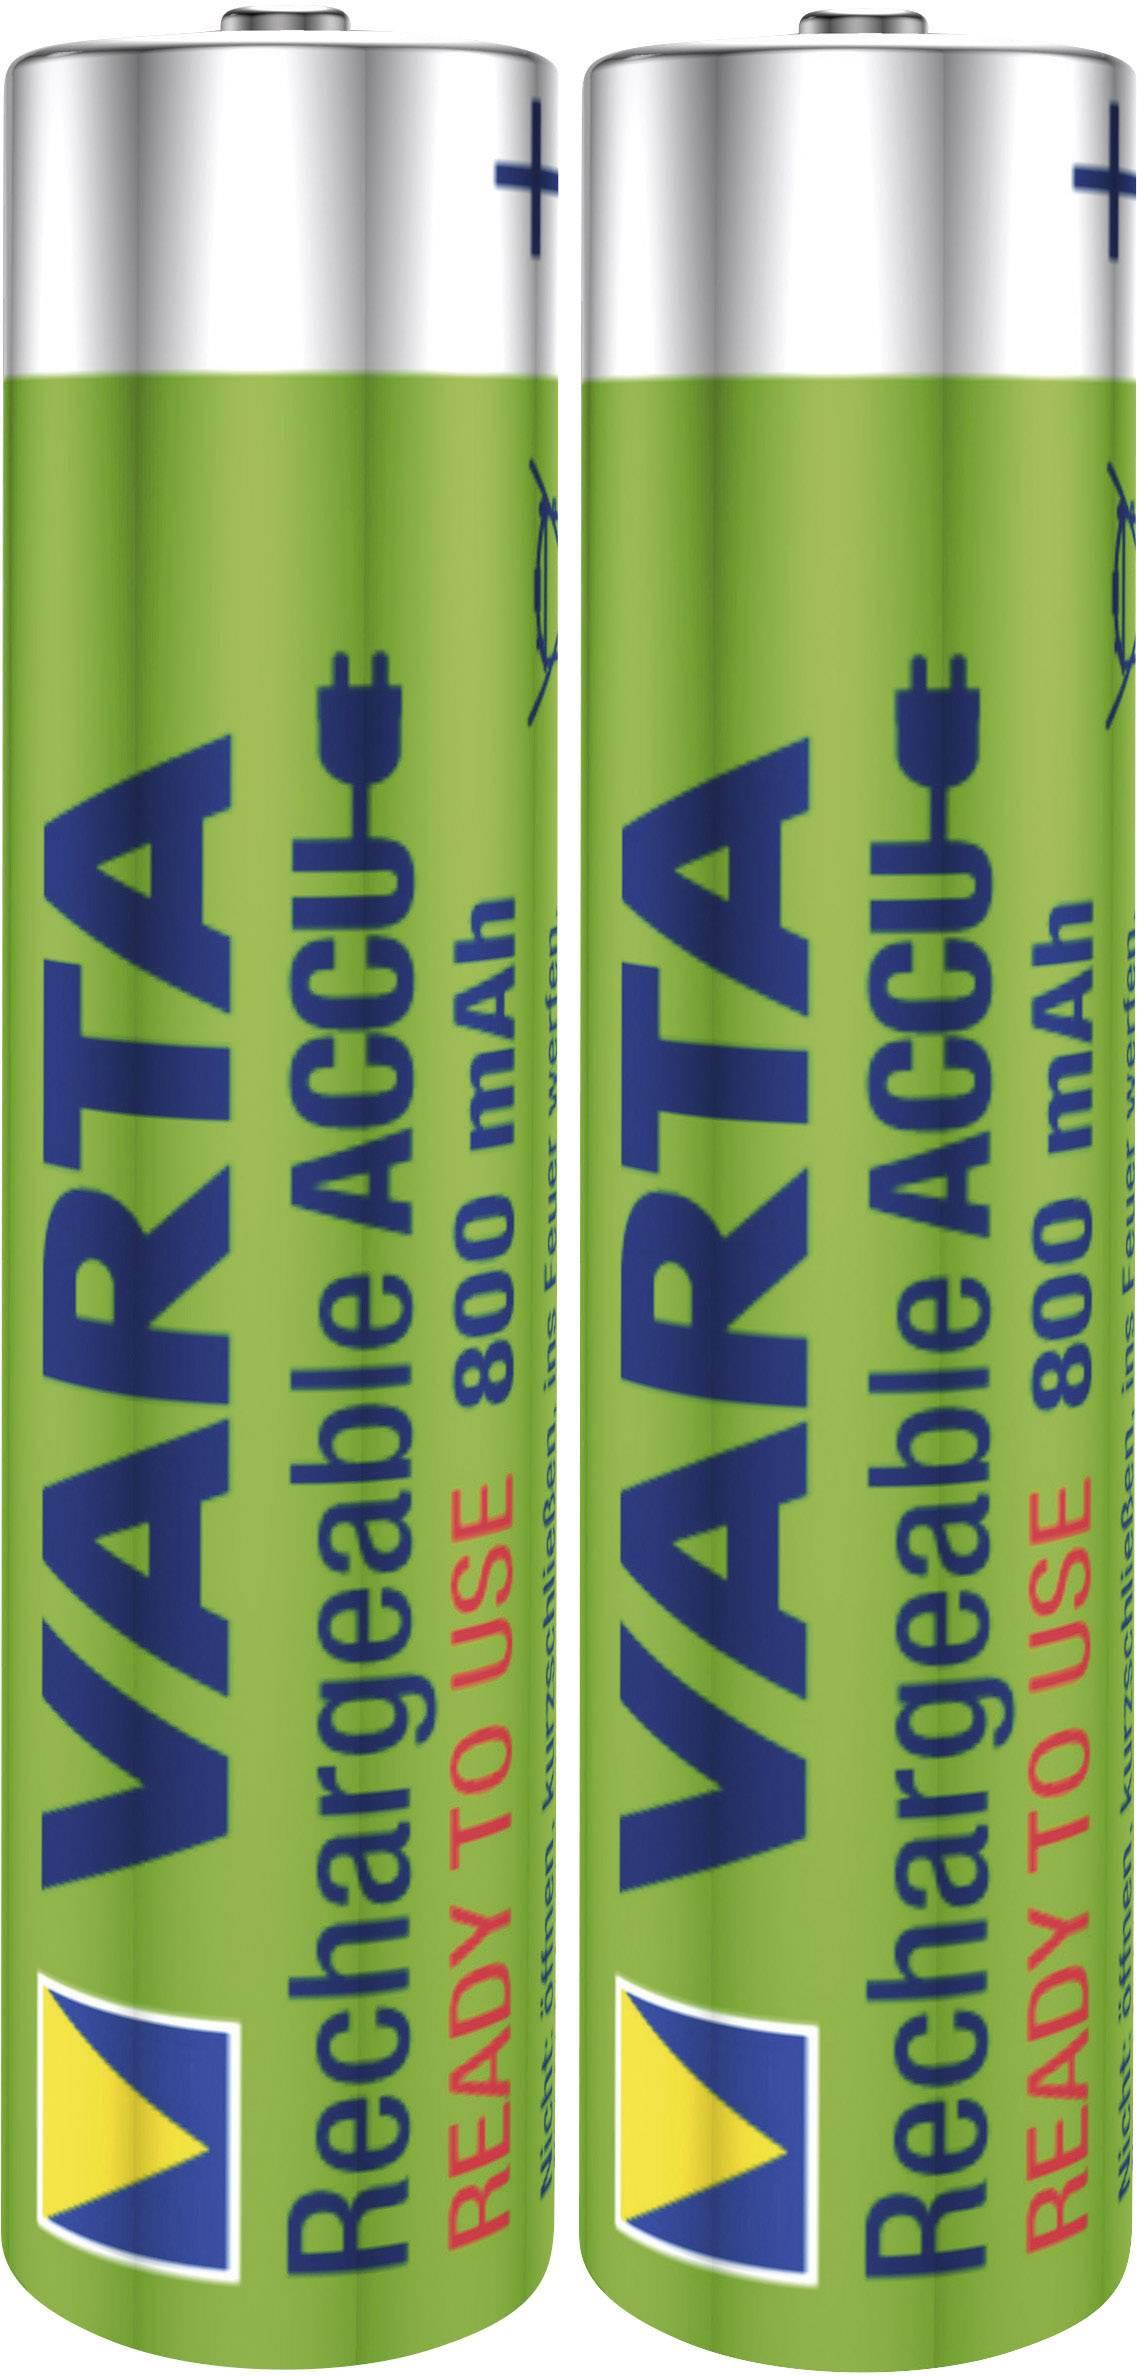 Mikrotužkový akumulátor typu AAA NiMH Varta Toy-Akku HR03 56783101402, 800 mAh, 1.2 V, 2 ks